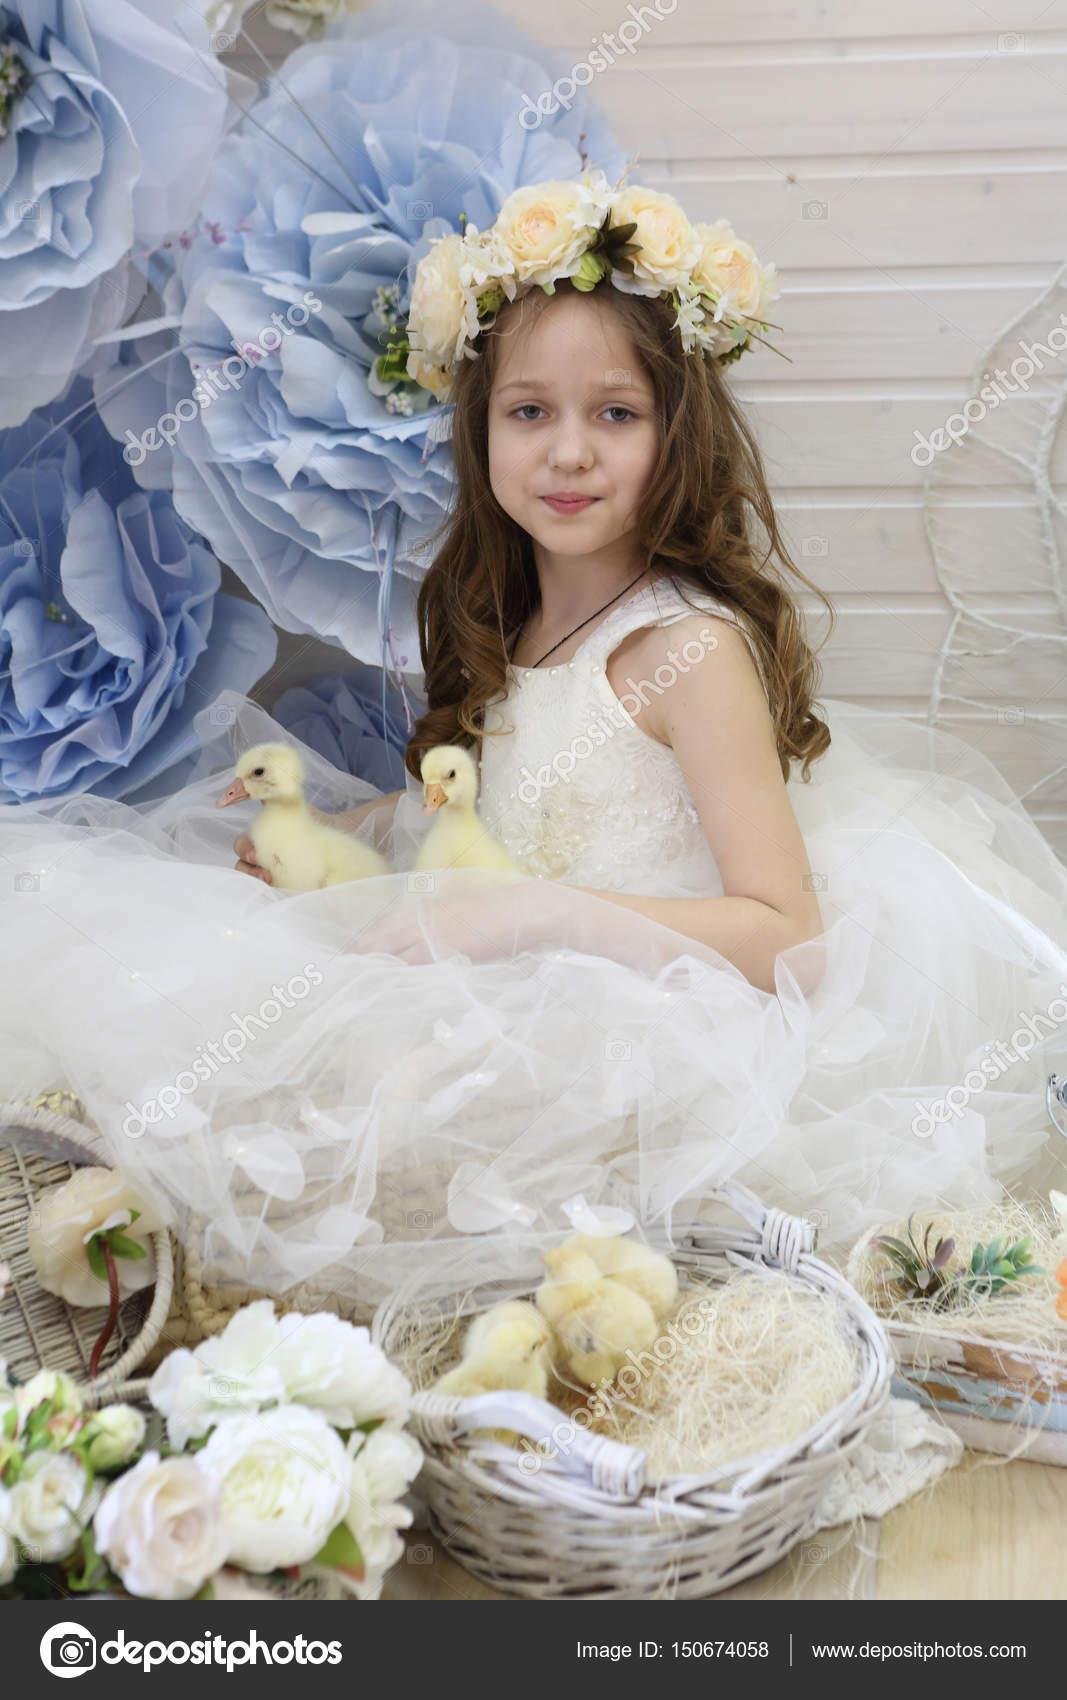 0513cfb95c3b Κορίτσι με ένα στεφάνι και ένα λευκό φόρεμα που παίζει με μια ζωντανή πάπια–  εικόνα αρχείου